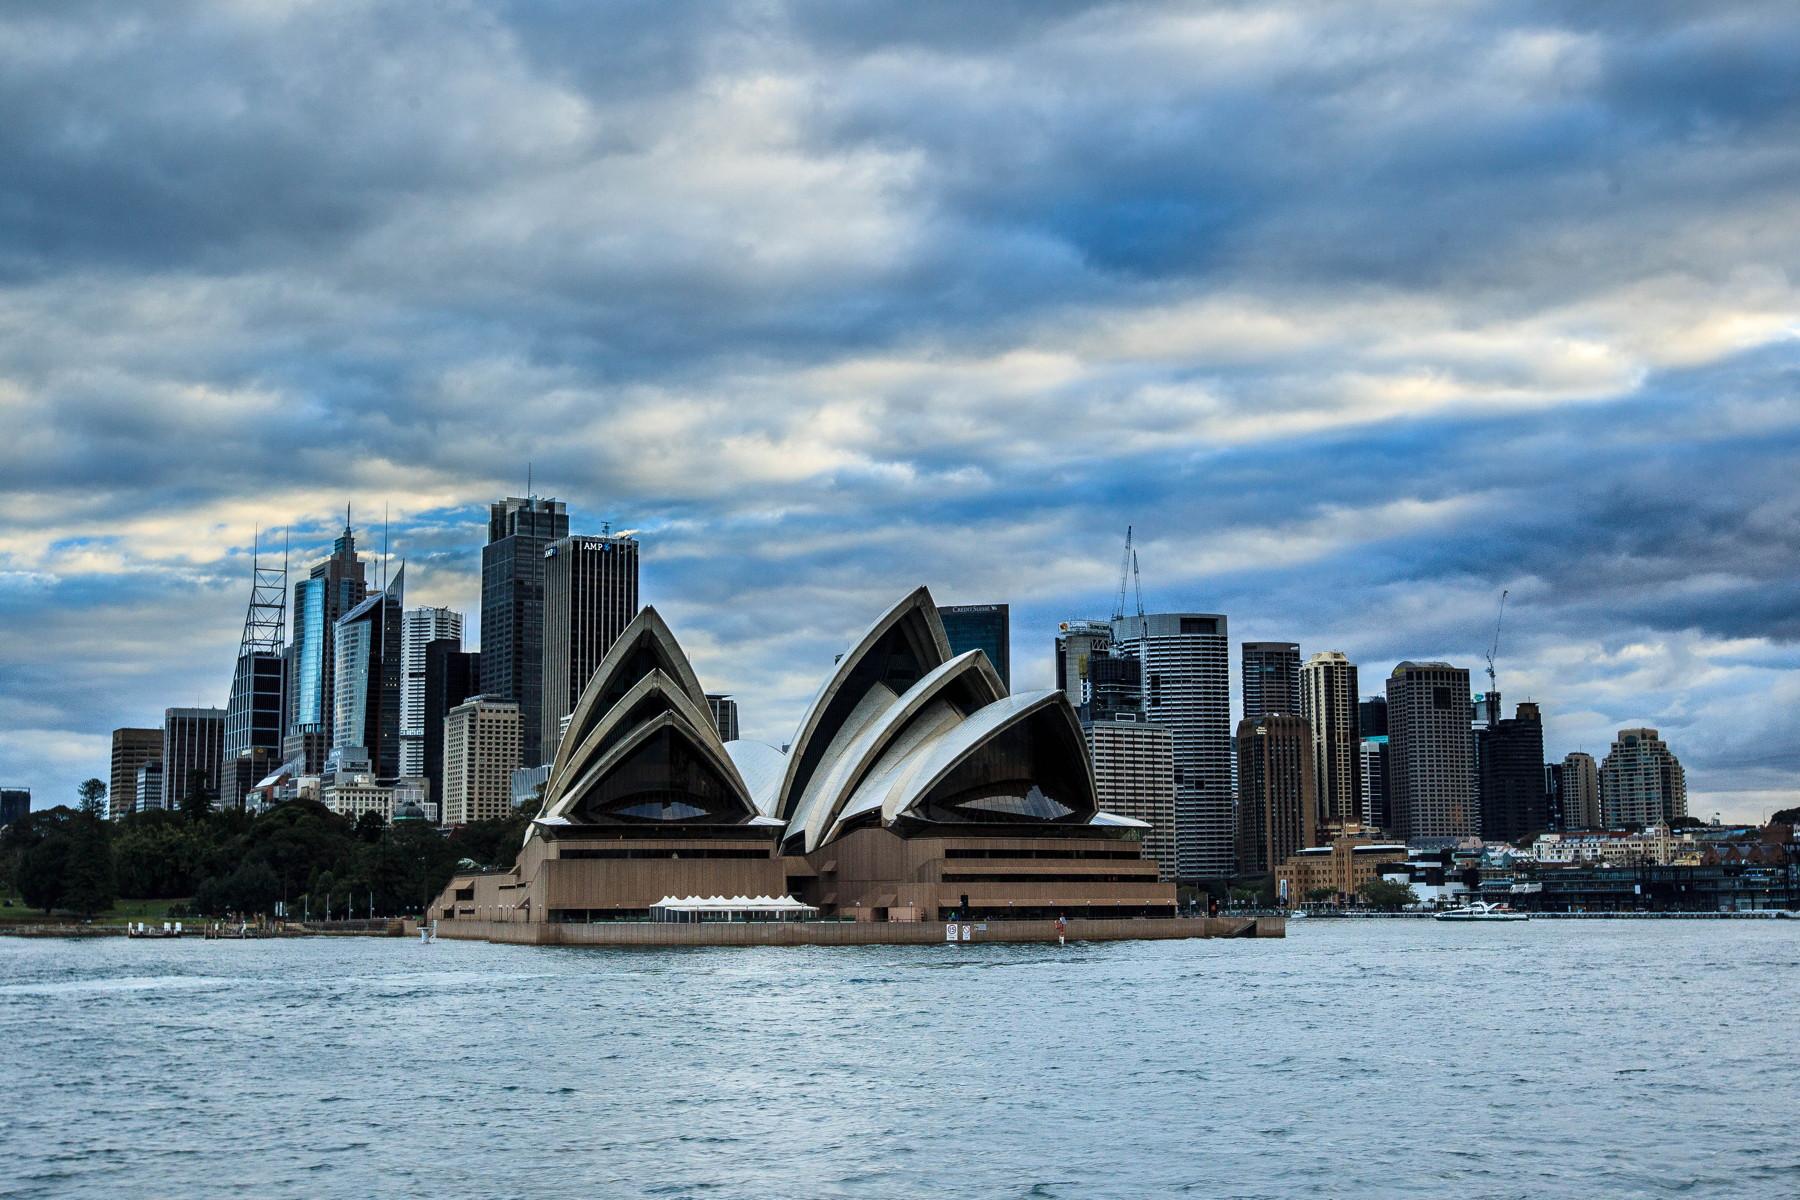 Back in Australia – Sydney